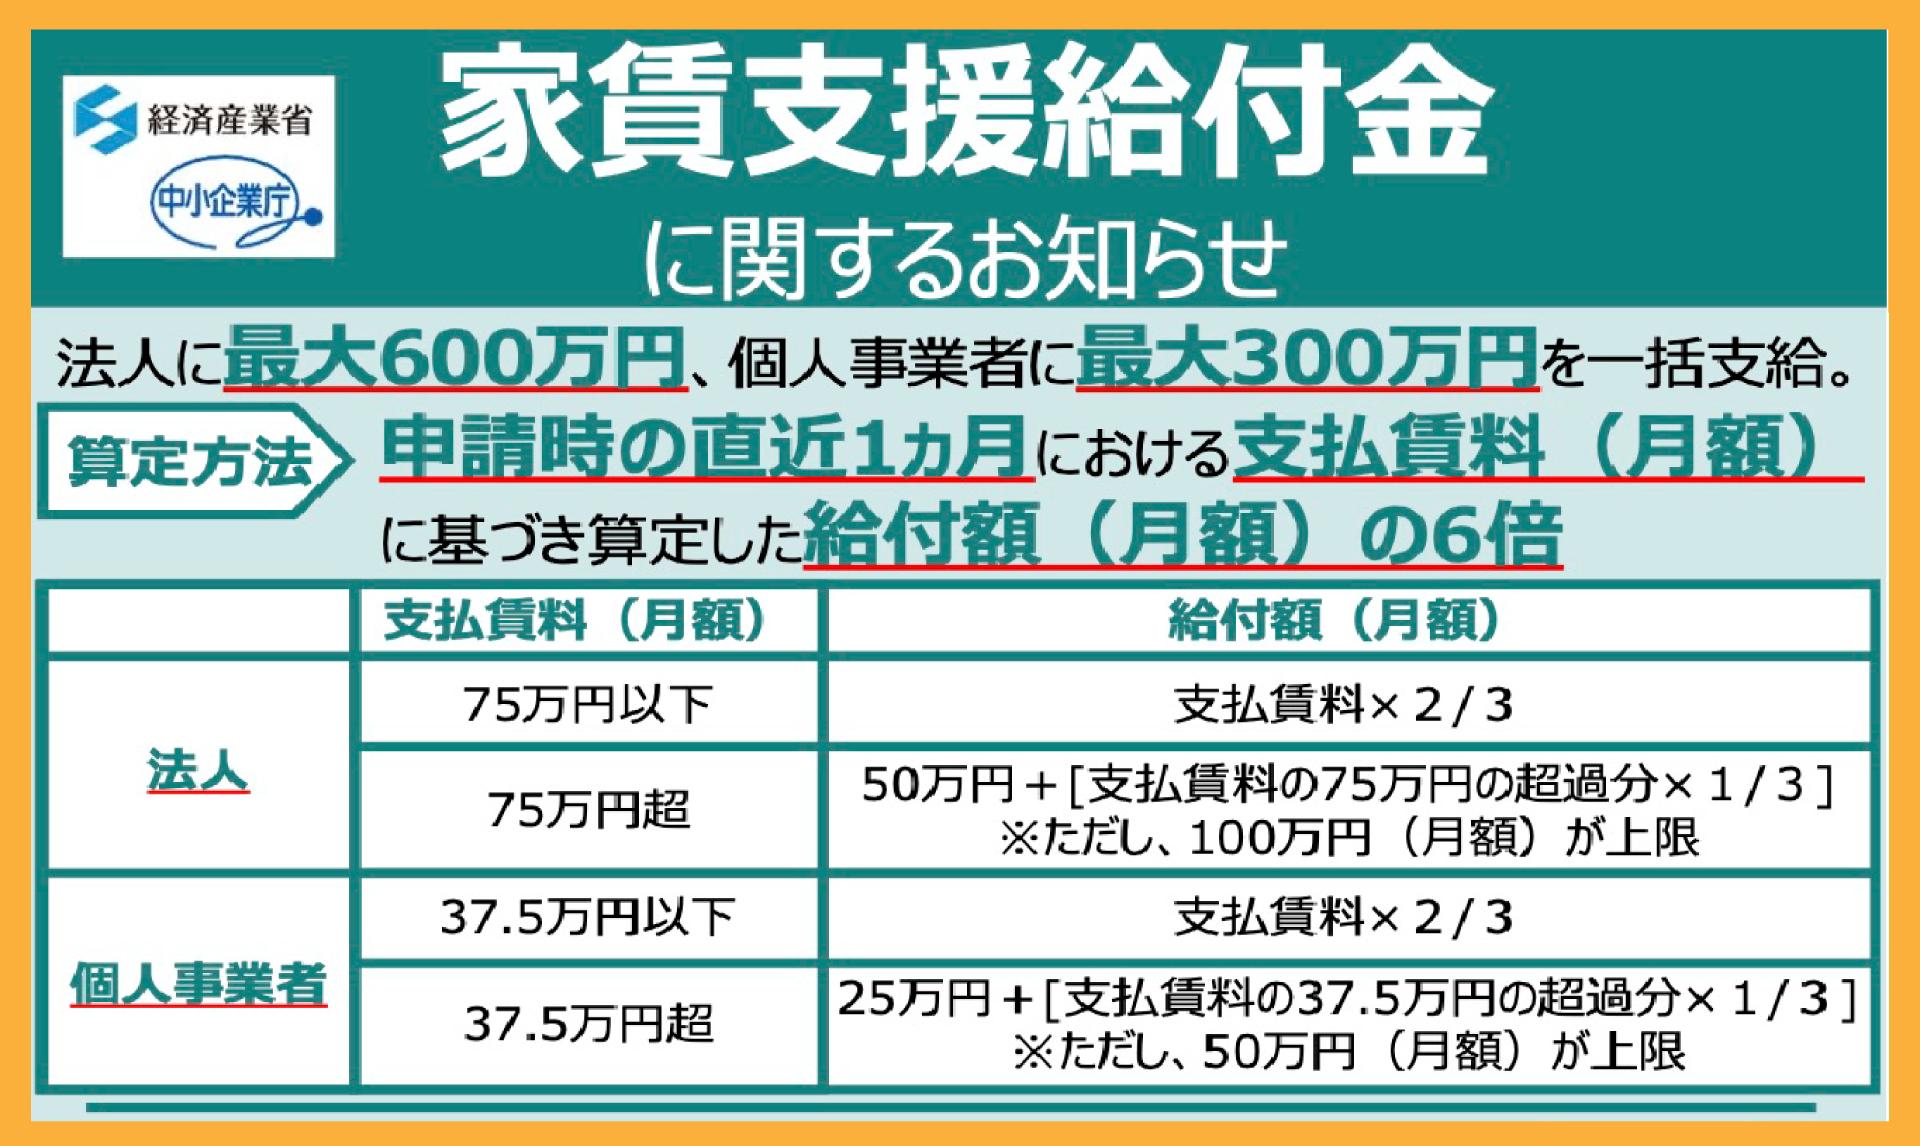 東京都 最大600万。企業・個人事業主に家賃支援給付金。対象や申請方法は?